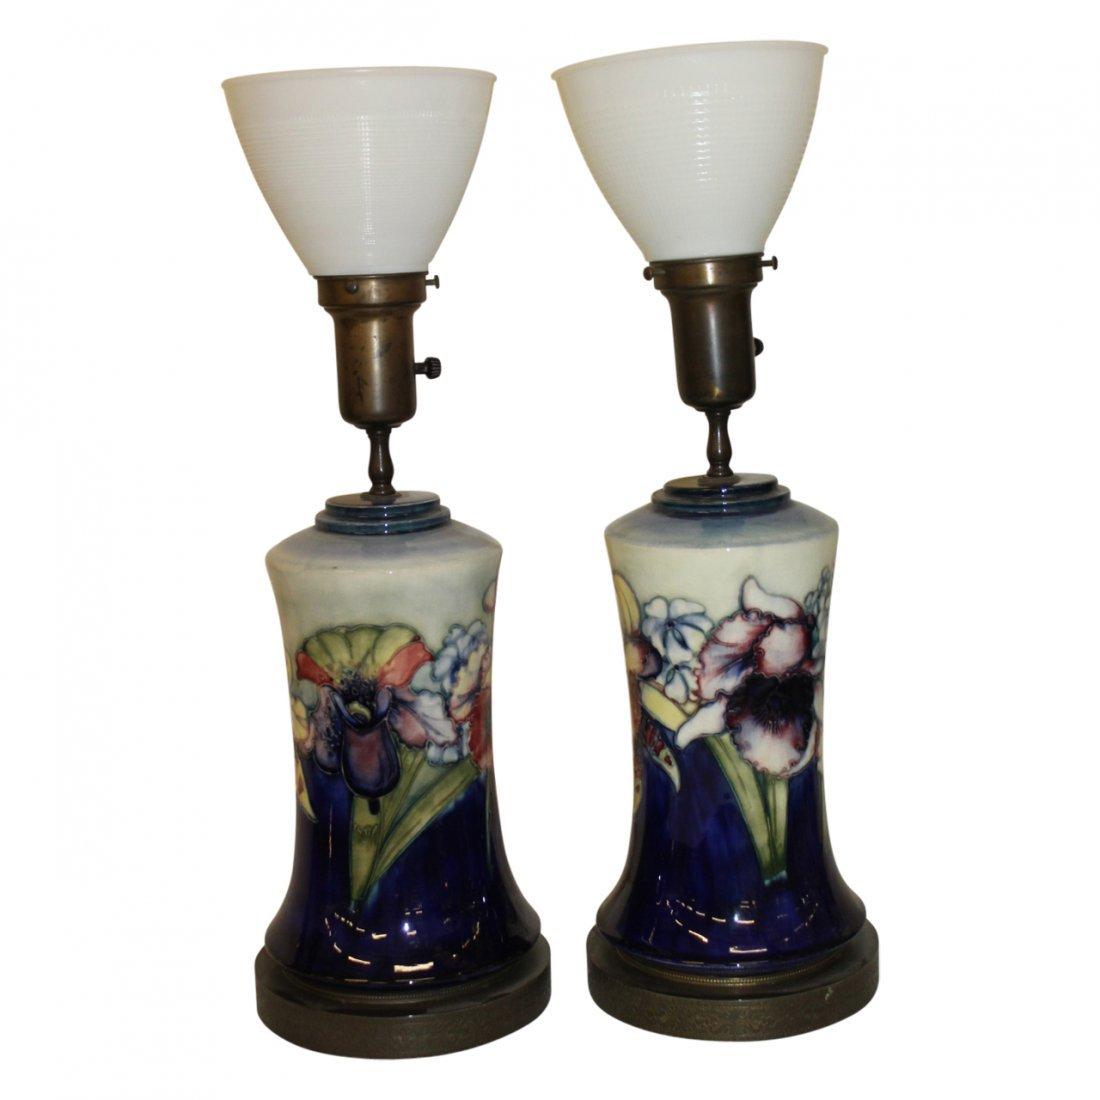 Pair of Moorcroft Lamps